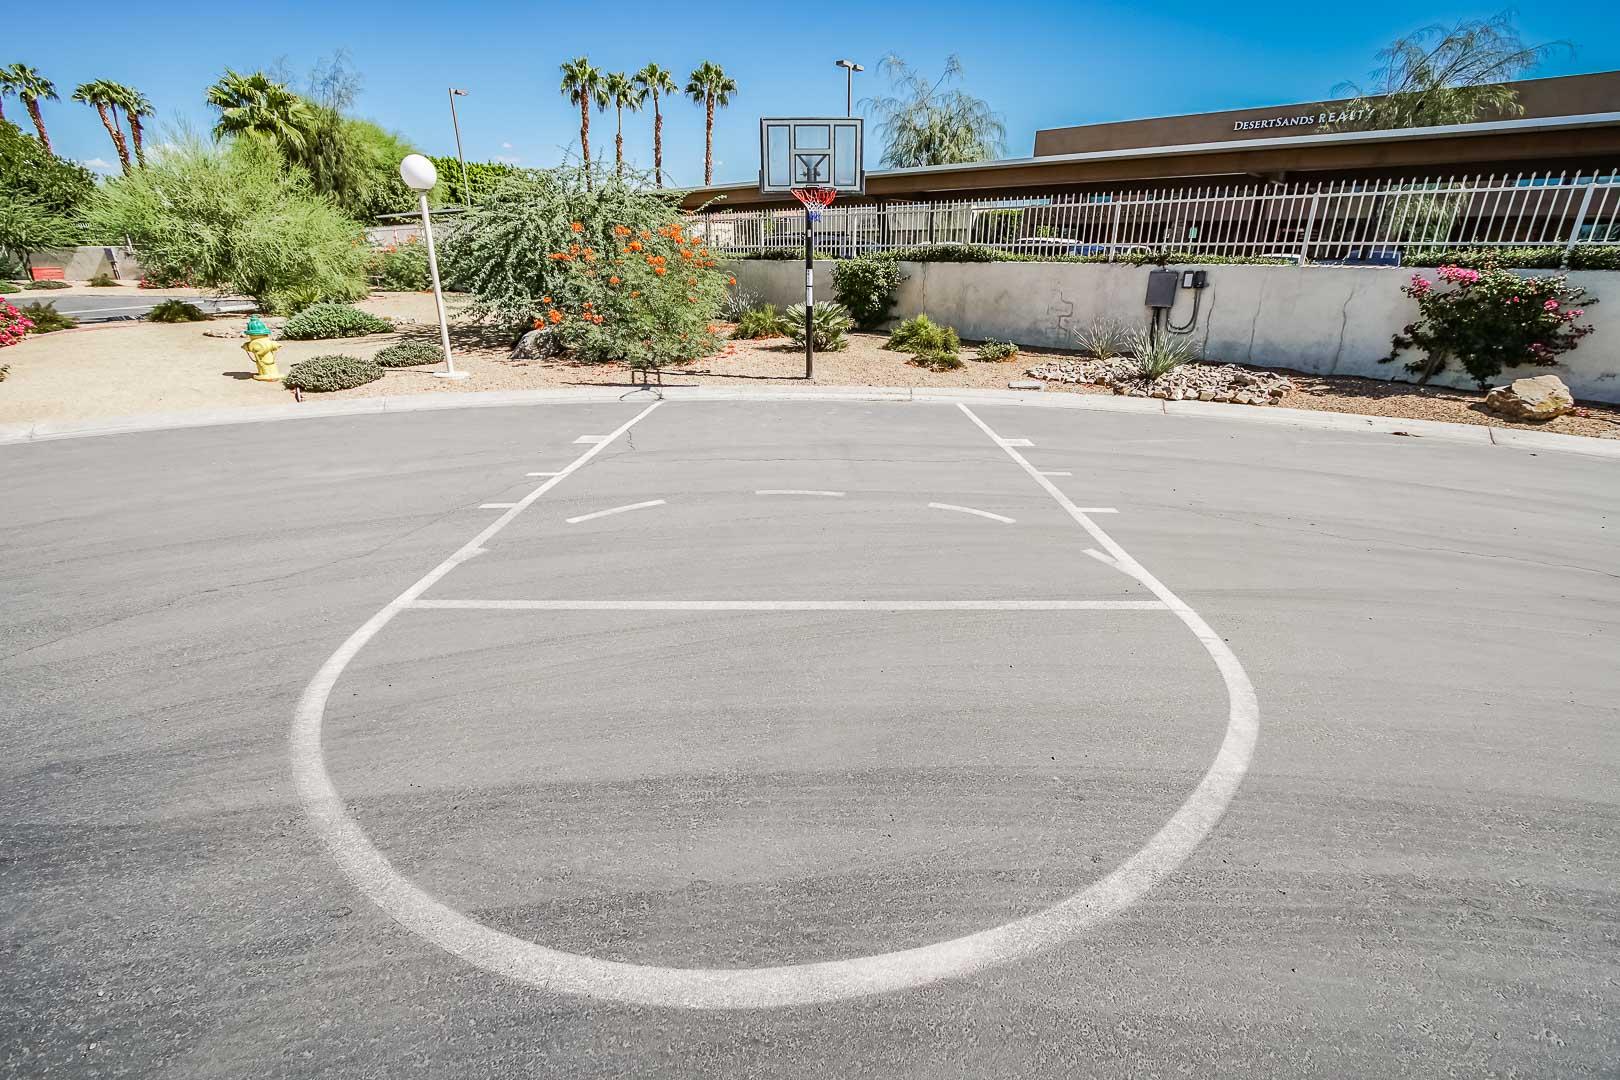 An expansive basketball court at VRI Americas' Desert Breezes Resort in California